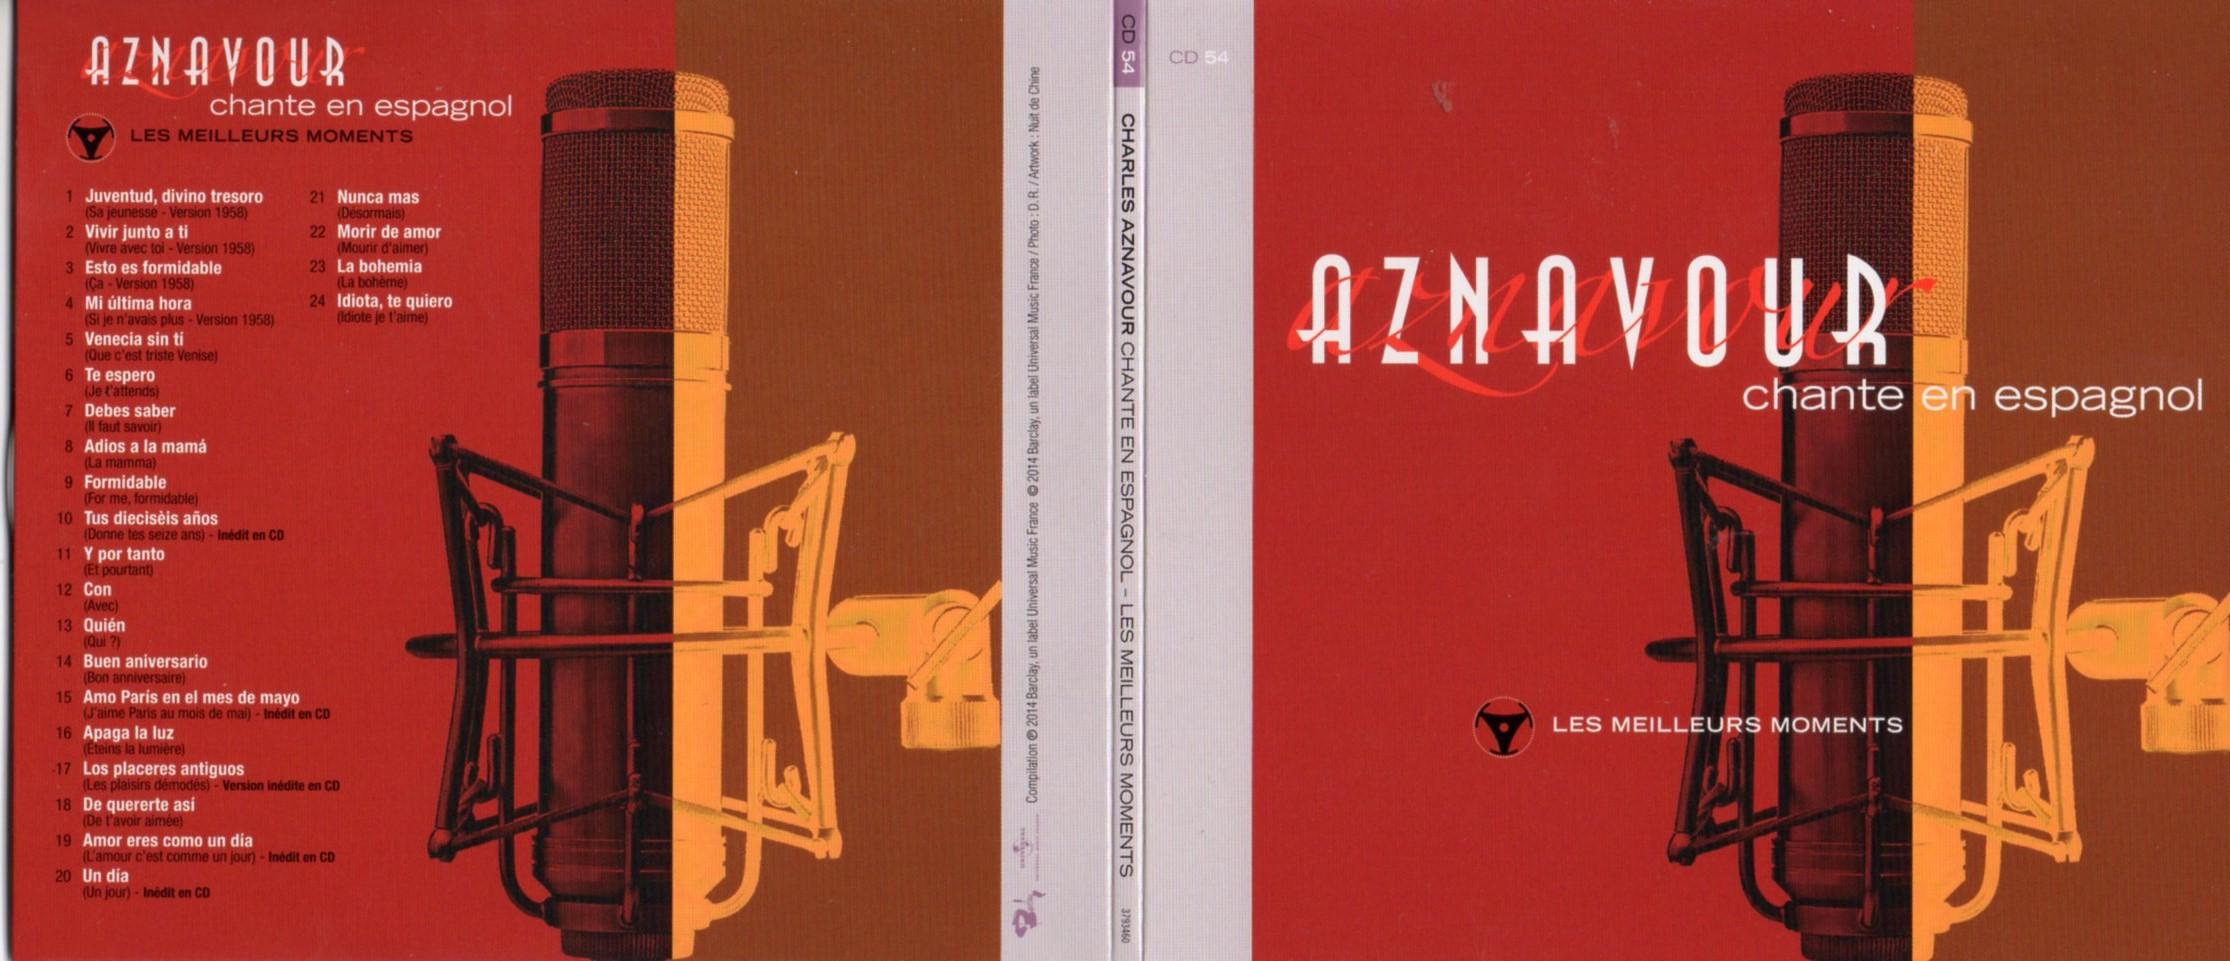 CHARLES AZNAVOUR - Chante en Espagnol - Canta en Español - Les meilleurs moments Gatefold Card board sleeve - CD